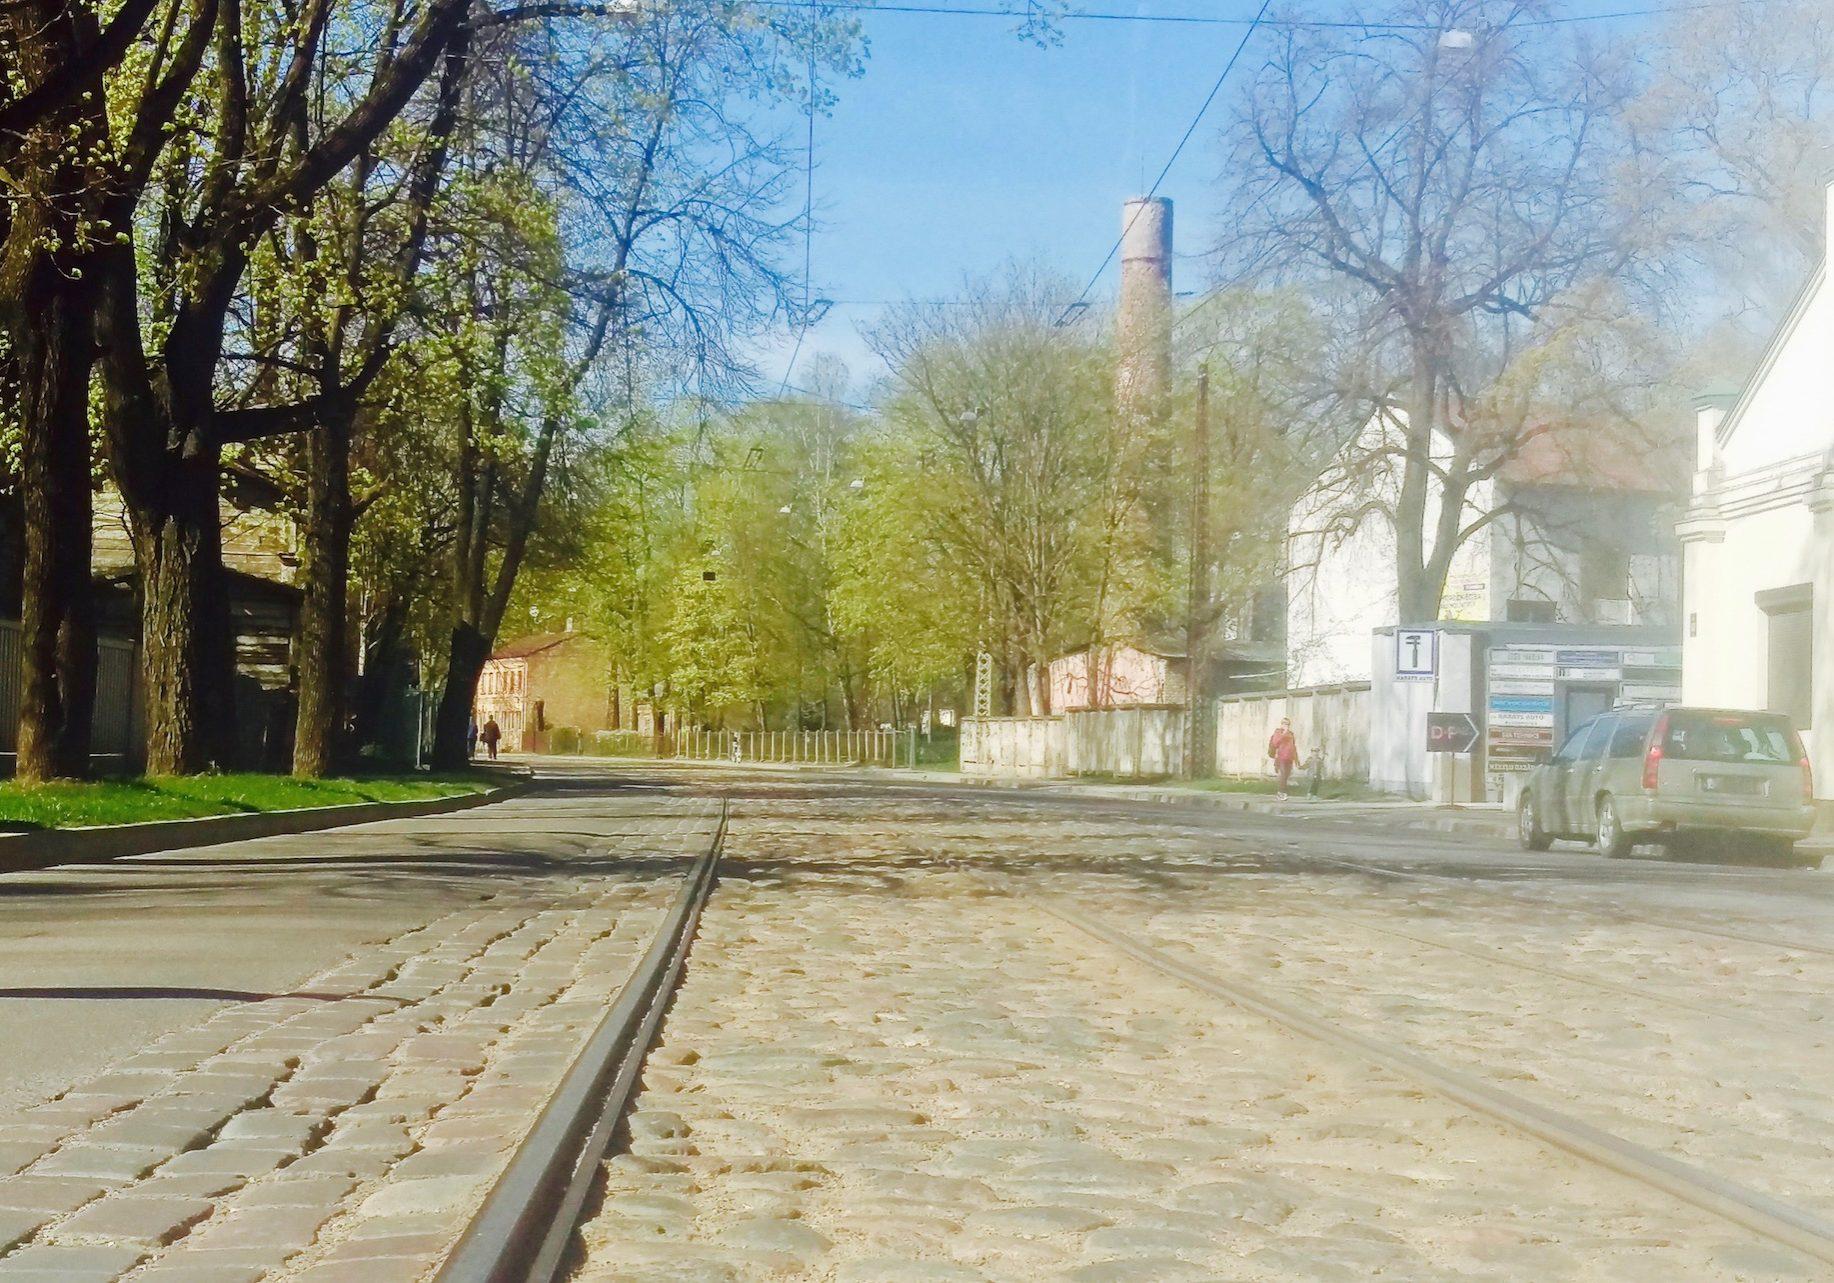 Slokas street & tram line